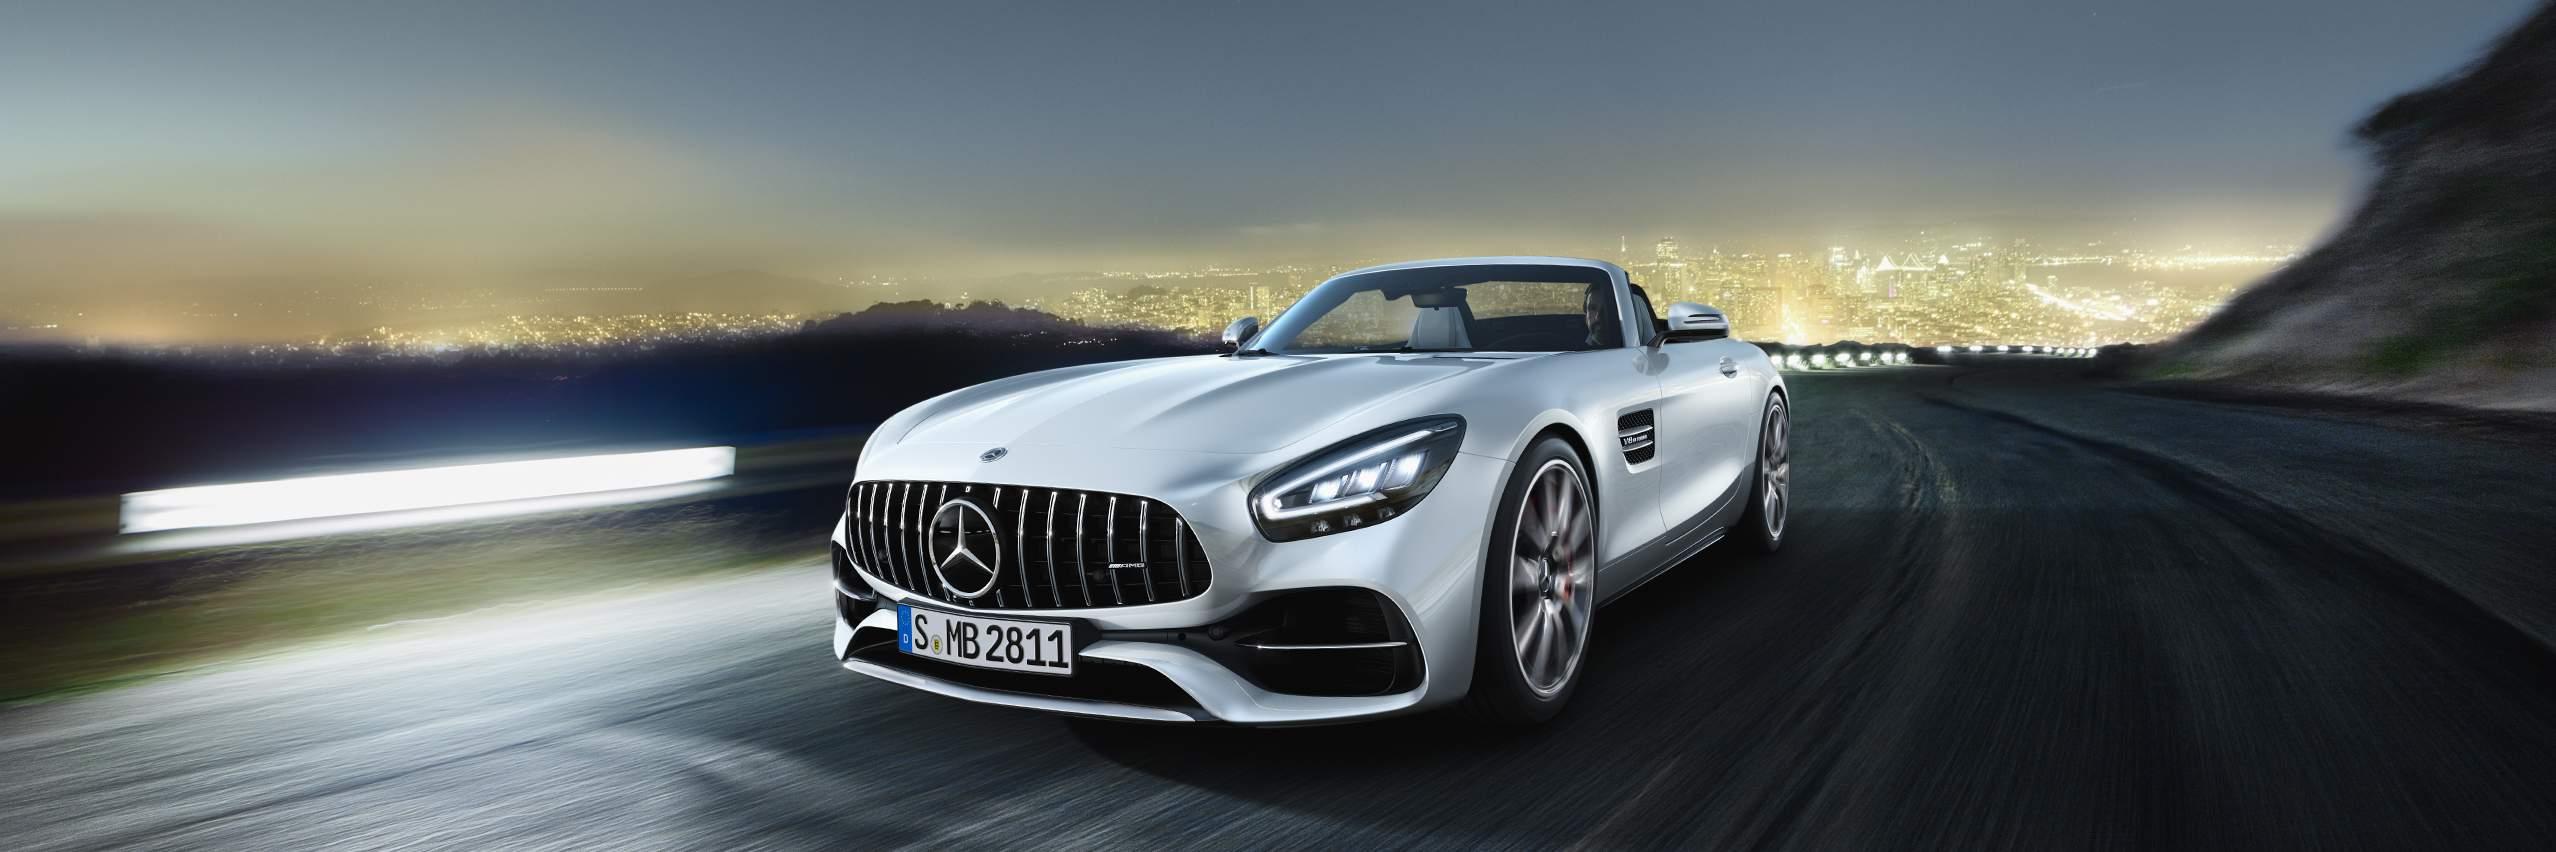 CAR-Avenue-Mercedes-AMG-GT-Roadster-Cabriolet-05